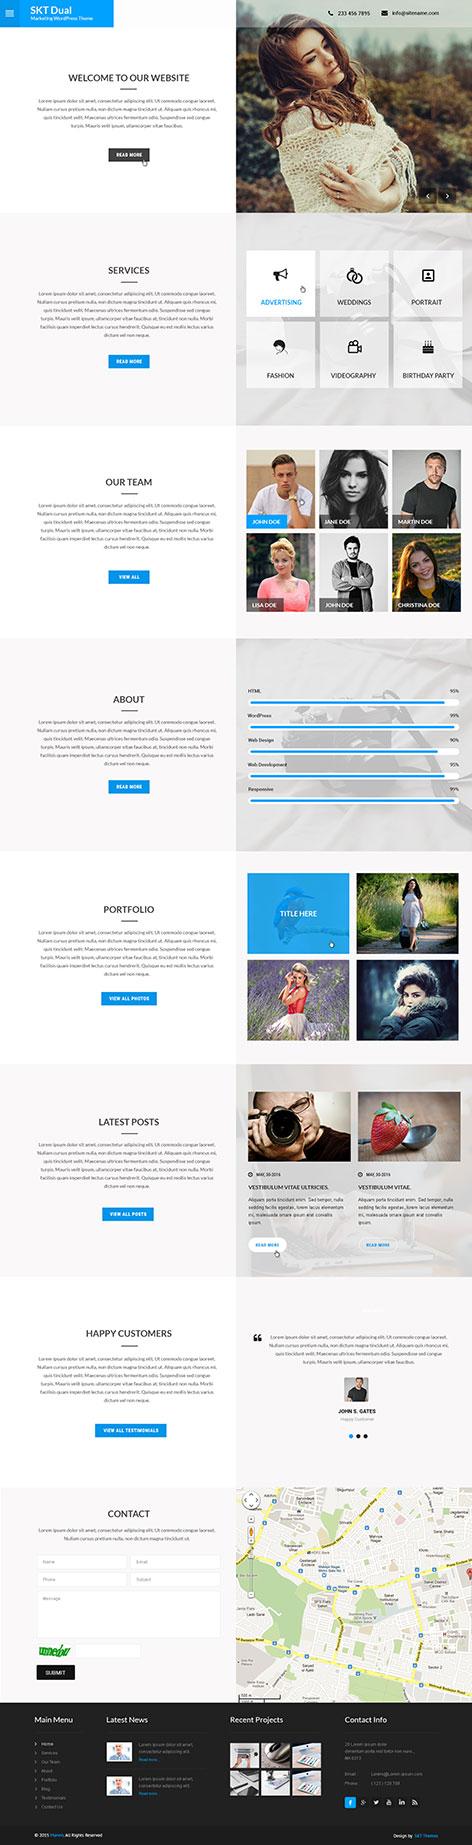 2 Screen WordPress theme